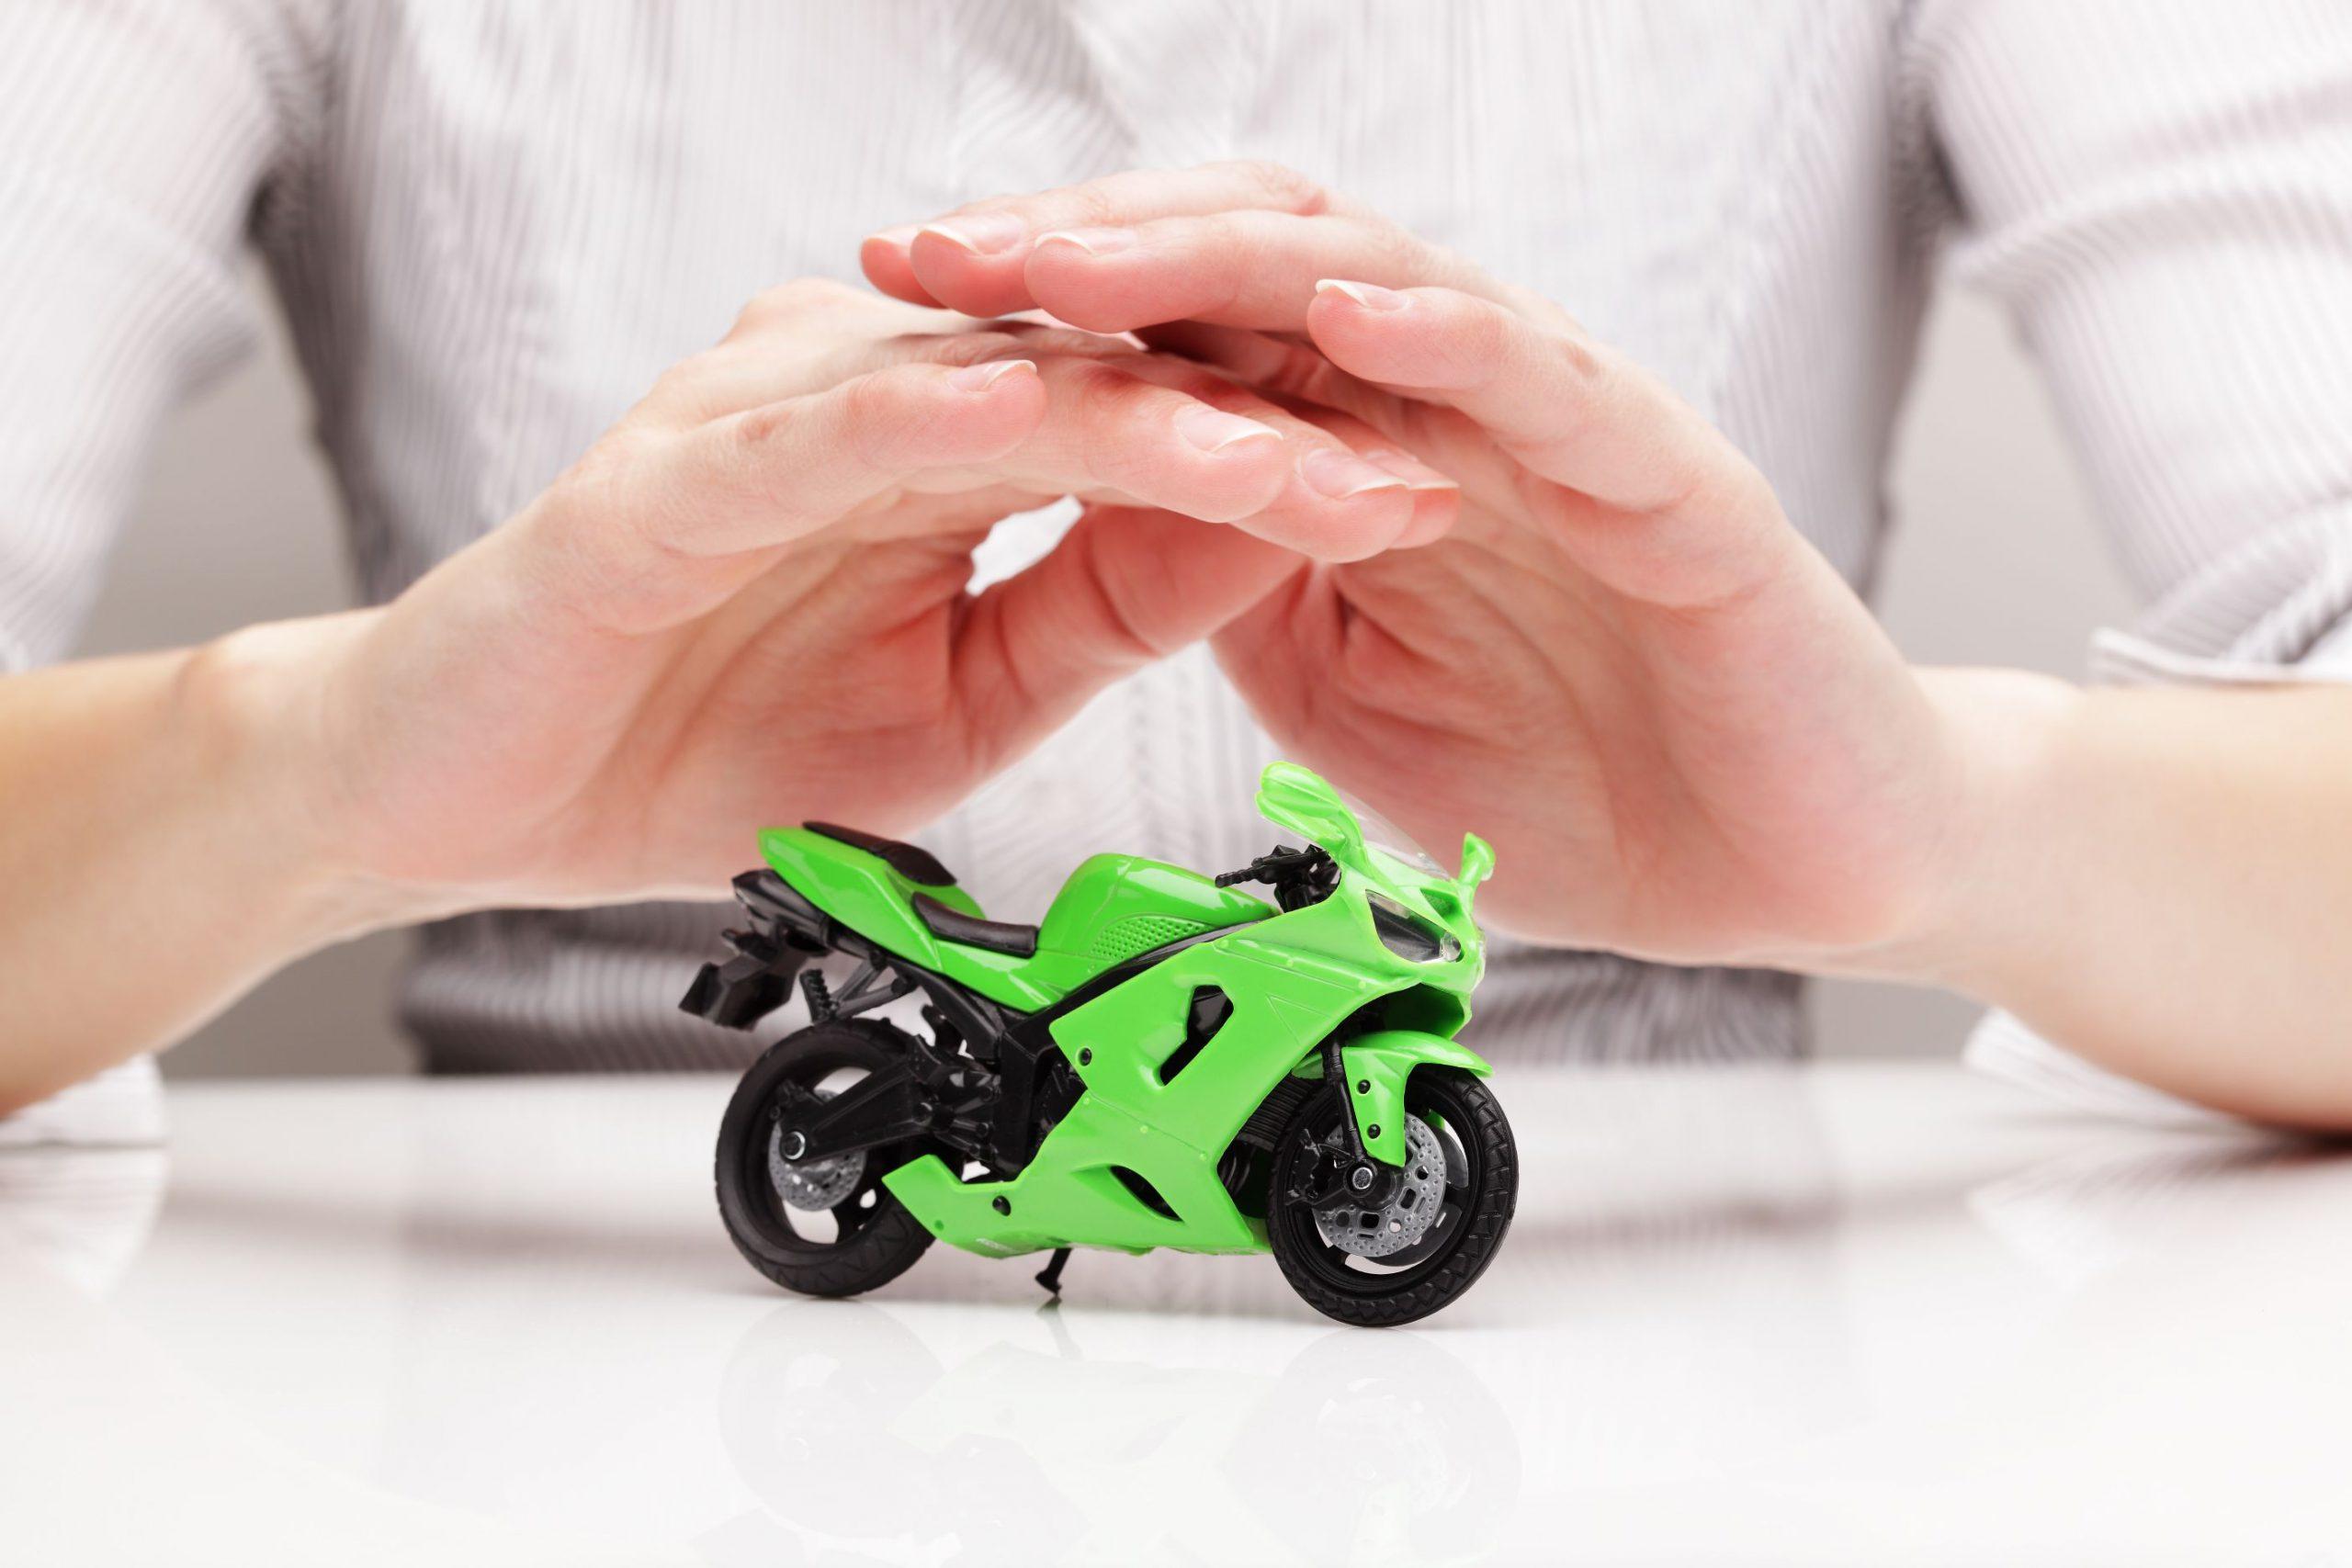 assurance moto sport harley davidson